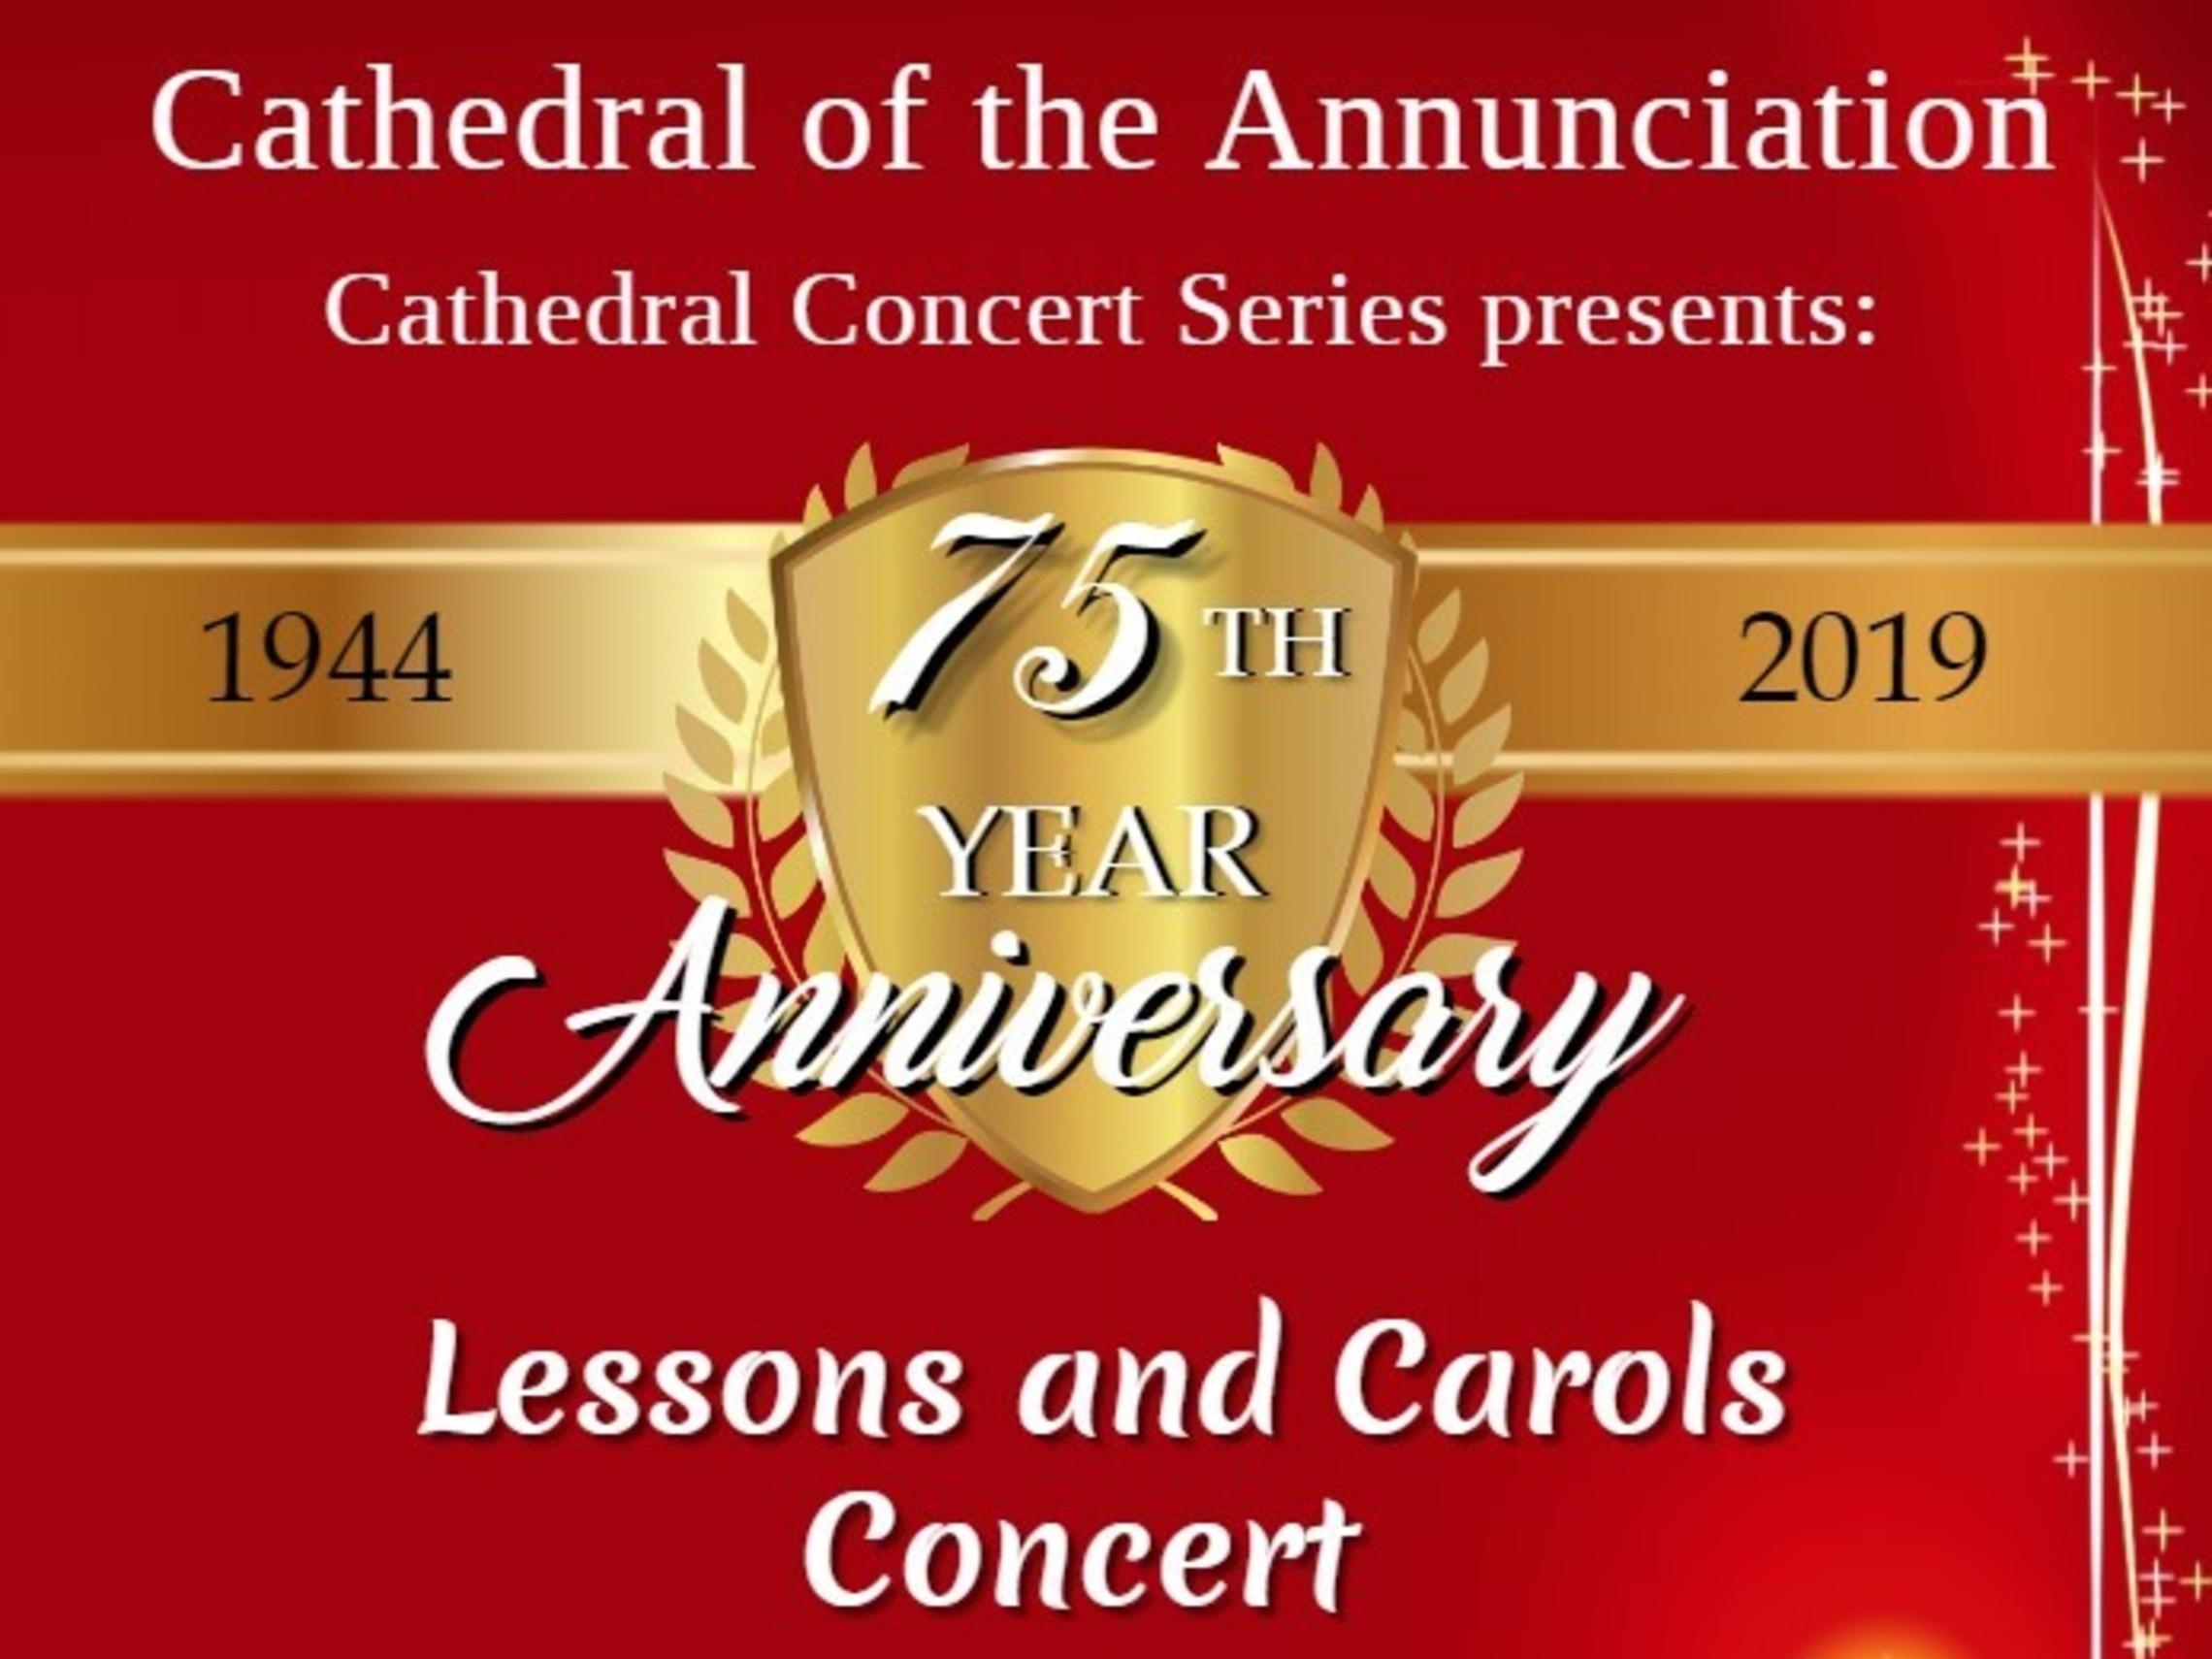 75th Anniversary Concert